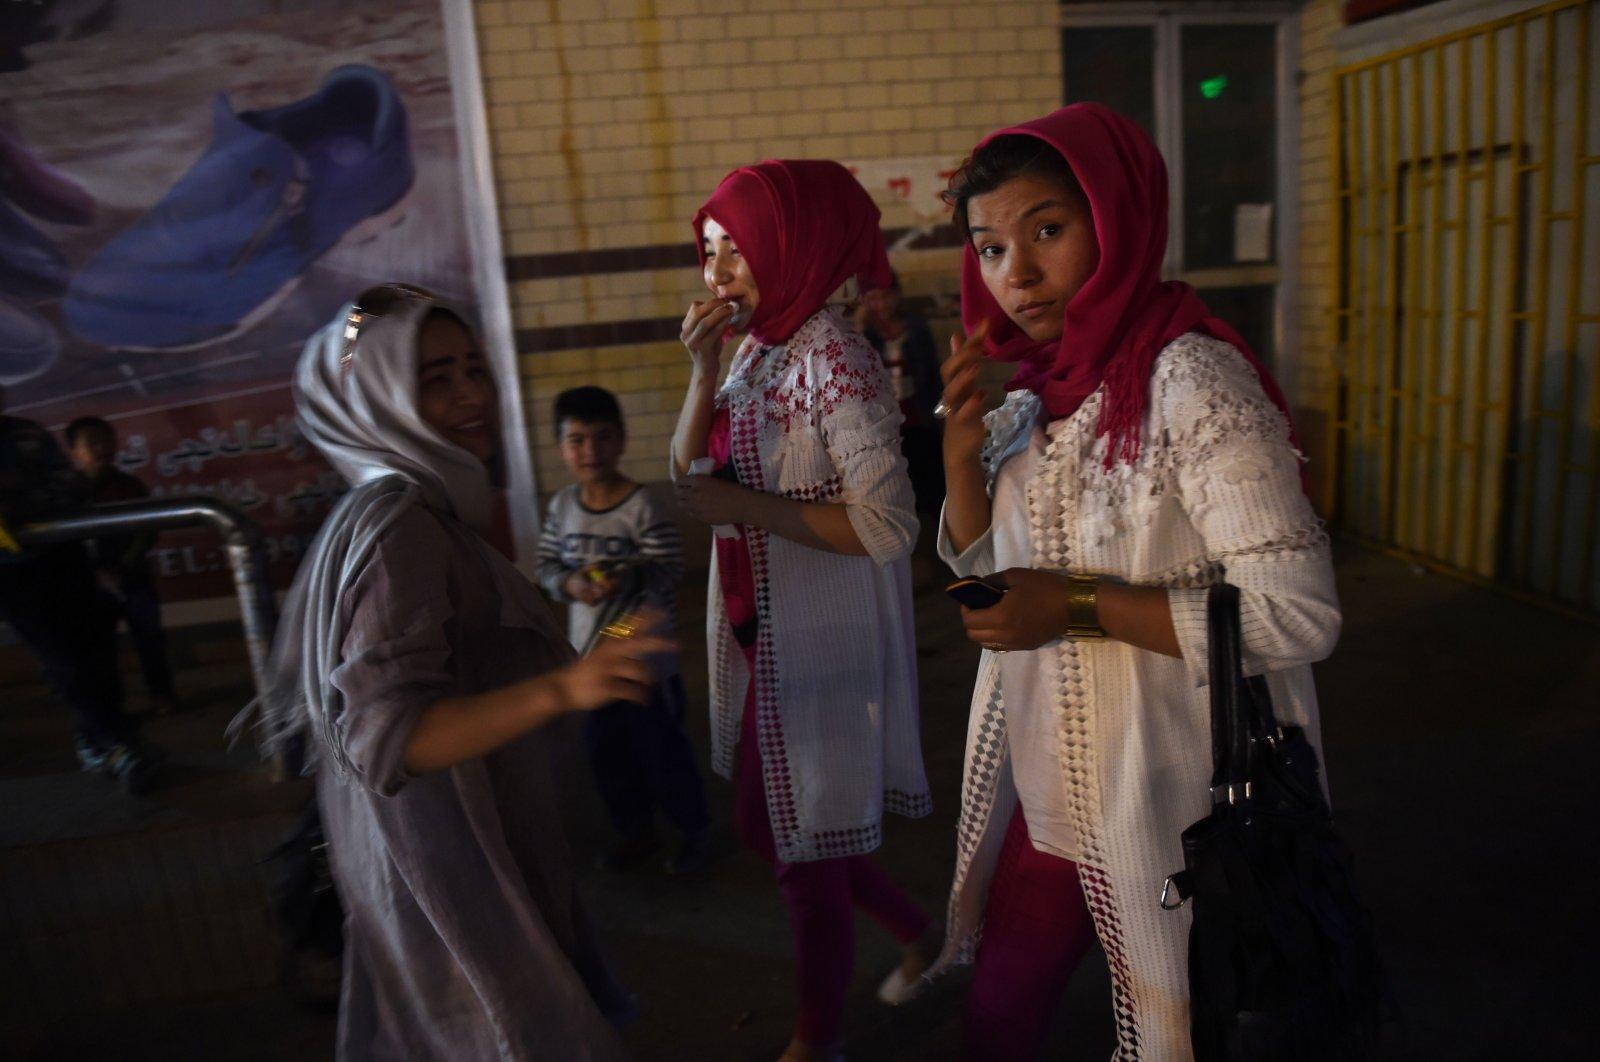 Uighur women at a market in Hotan, Xinjiang Uygur Autonomous Region, western China, April 16, 2015. (AFP Photo)